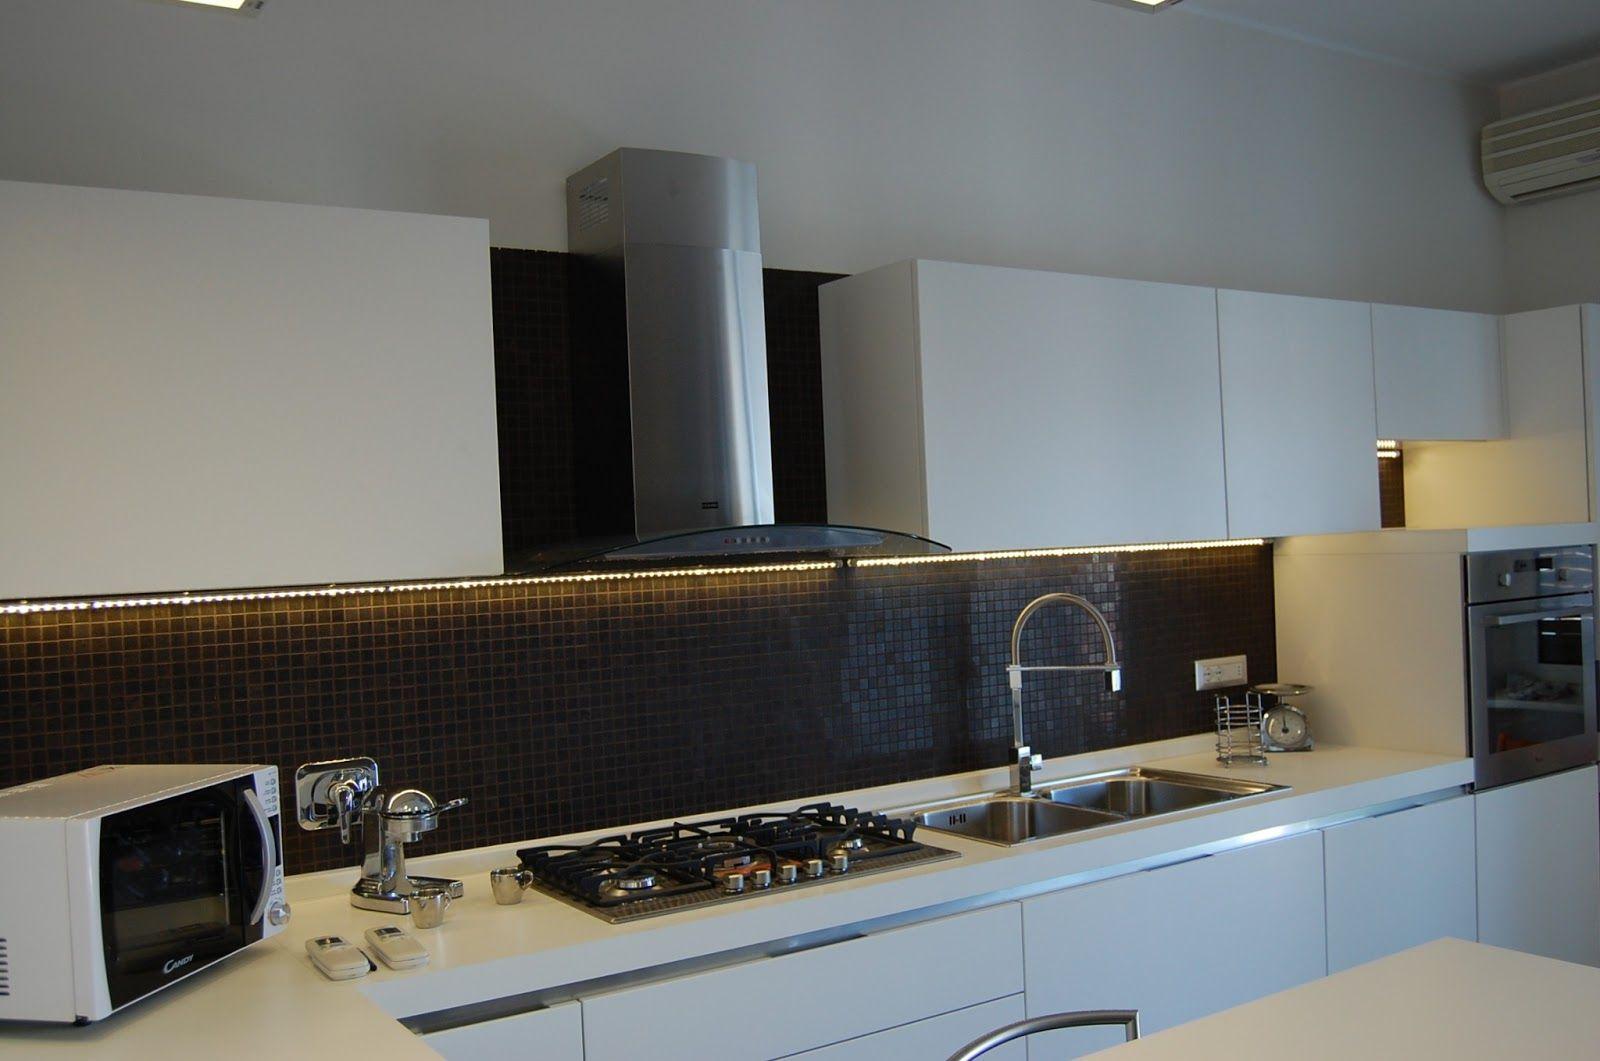 una cucina illuminata con una striscia led | casa | Pinterest | LED ...